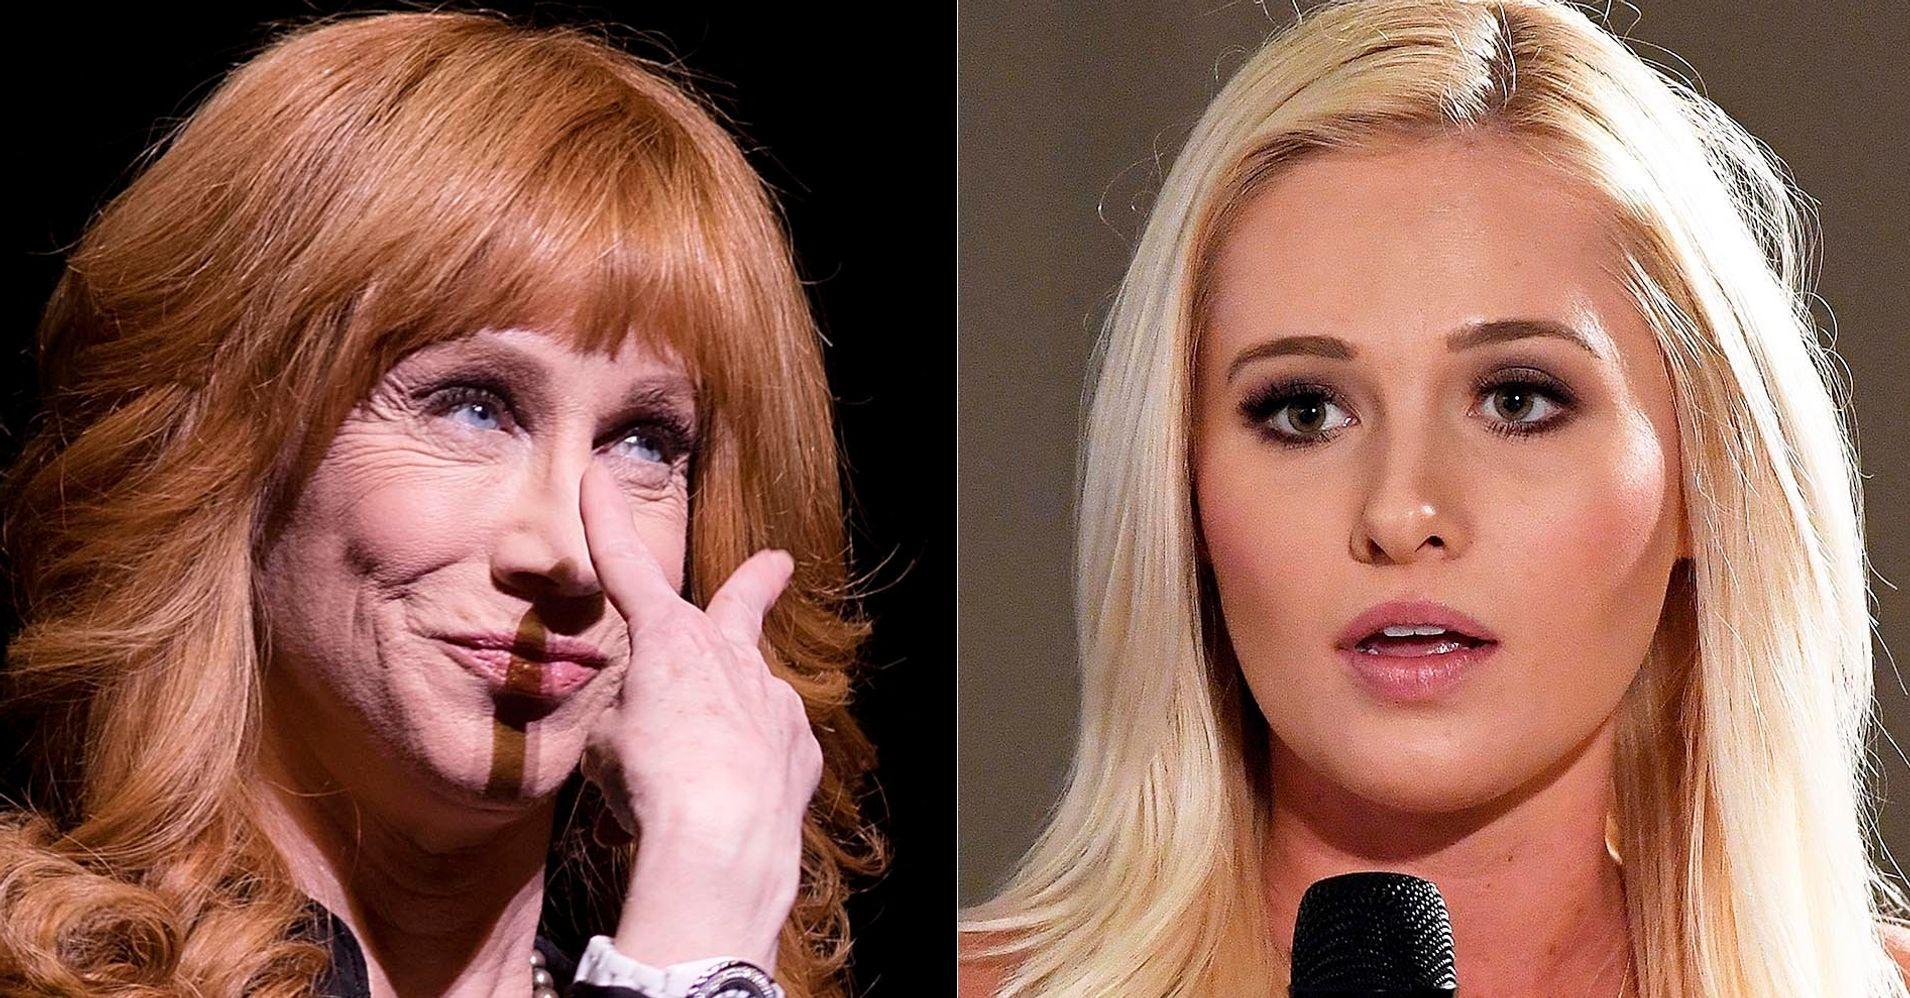 Kathy Griffin Tells Tomi Lahren To 'Go F**k Herself' In Scathing Tweet